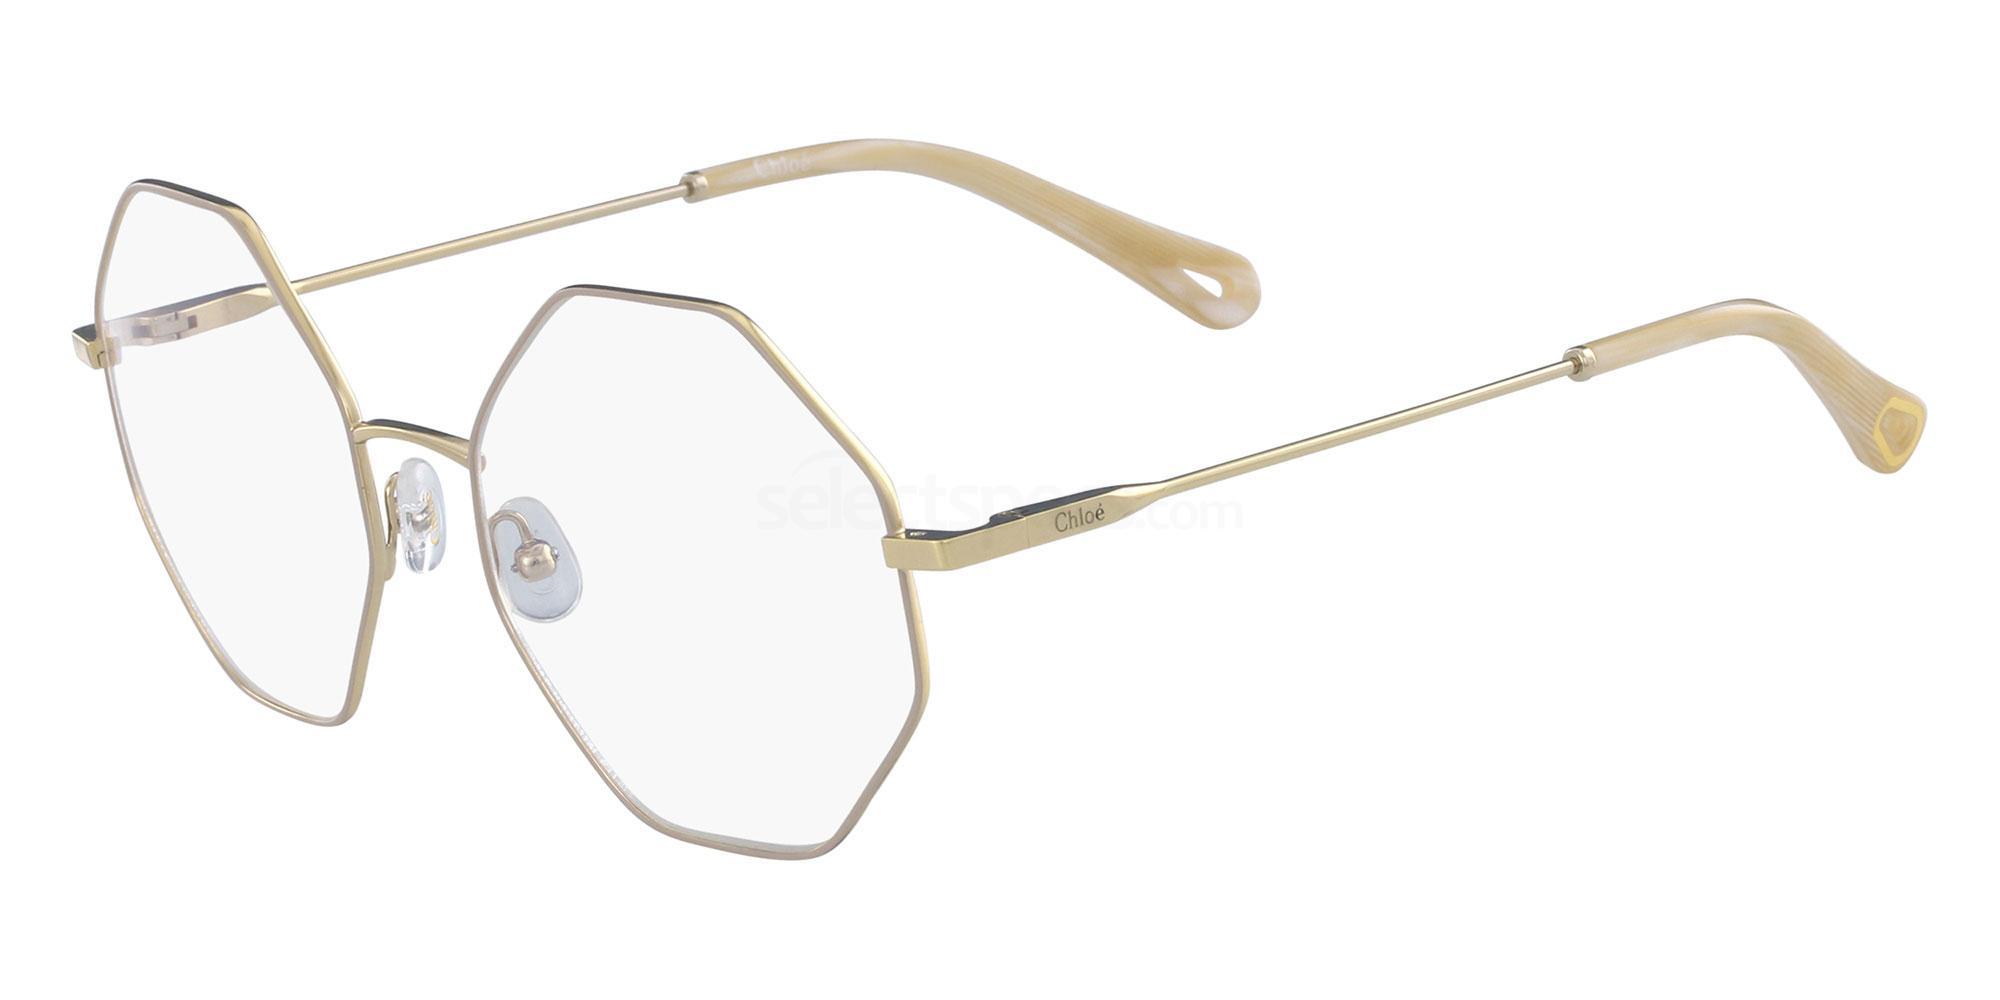 743 CE2134 Glasses, Chloe